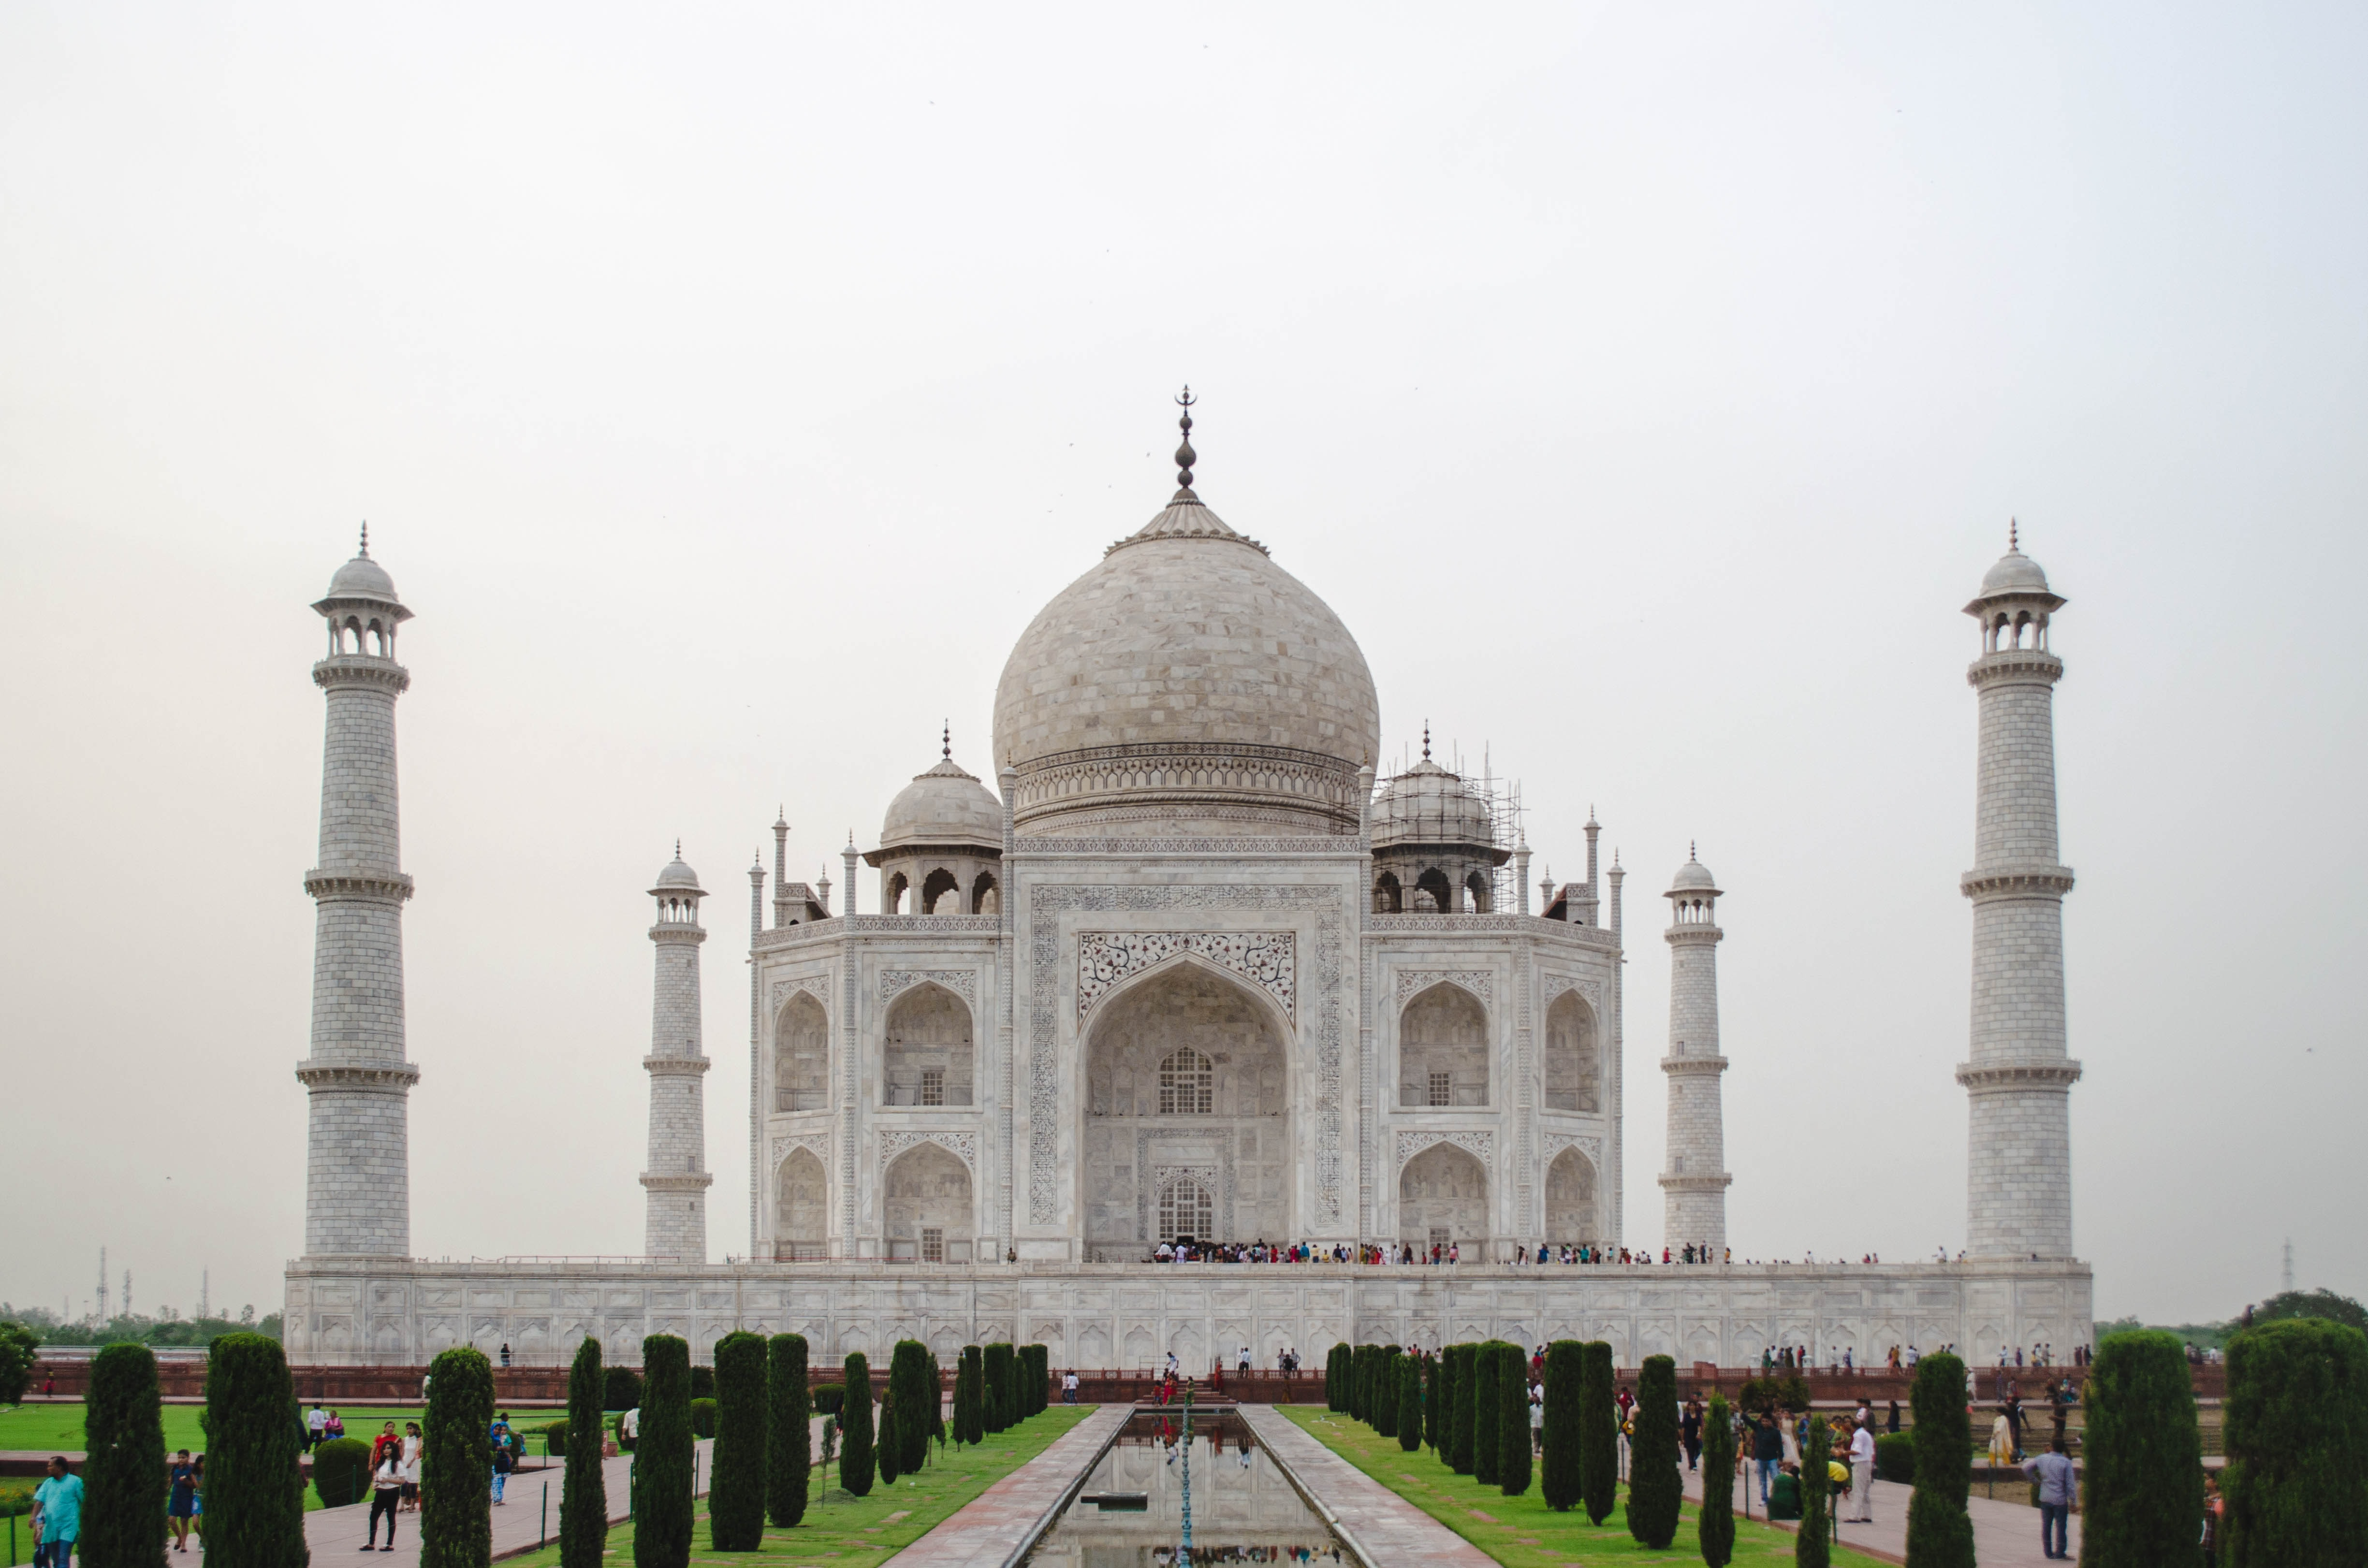 Taj Mahal in Agra,Stunning architecture